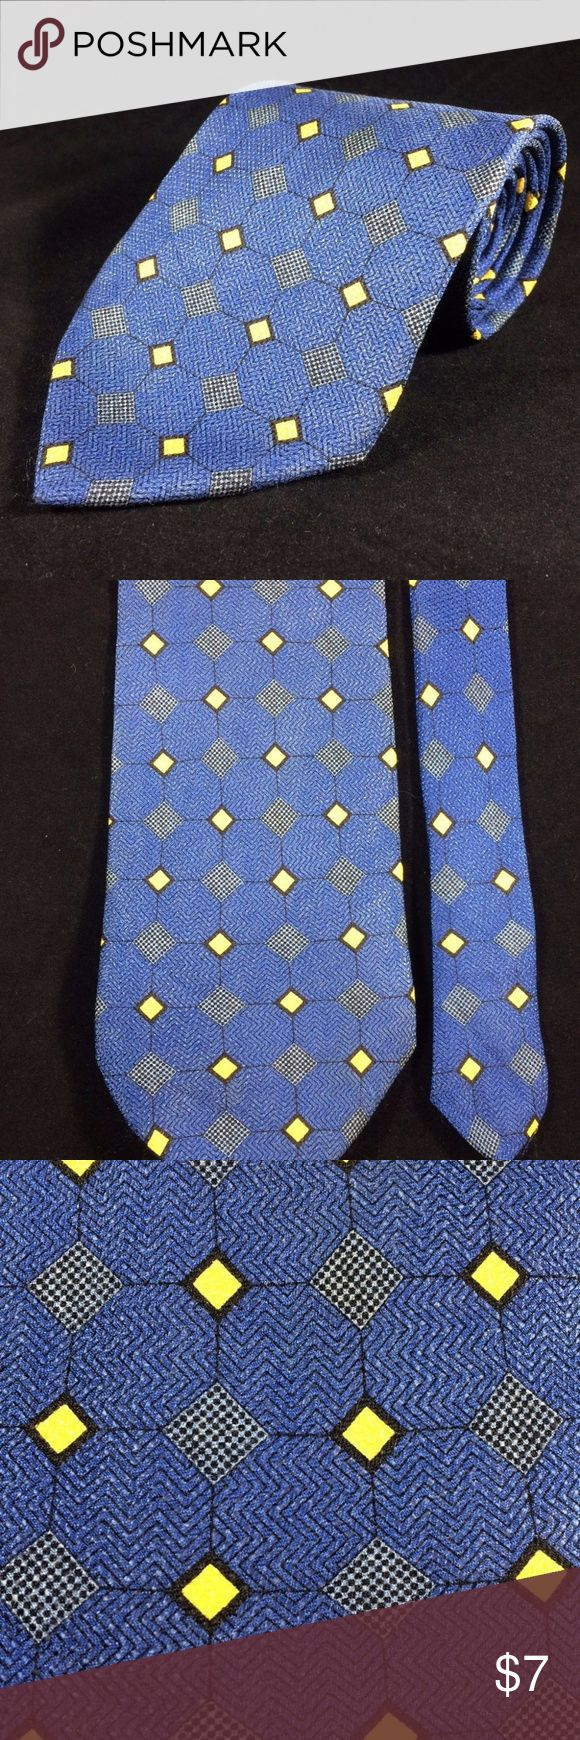 ADDENDUM Mens Tie Blue Yellow Diamonds Silk